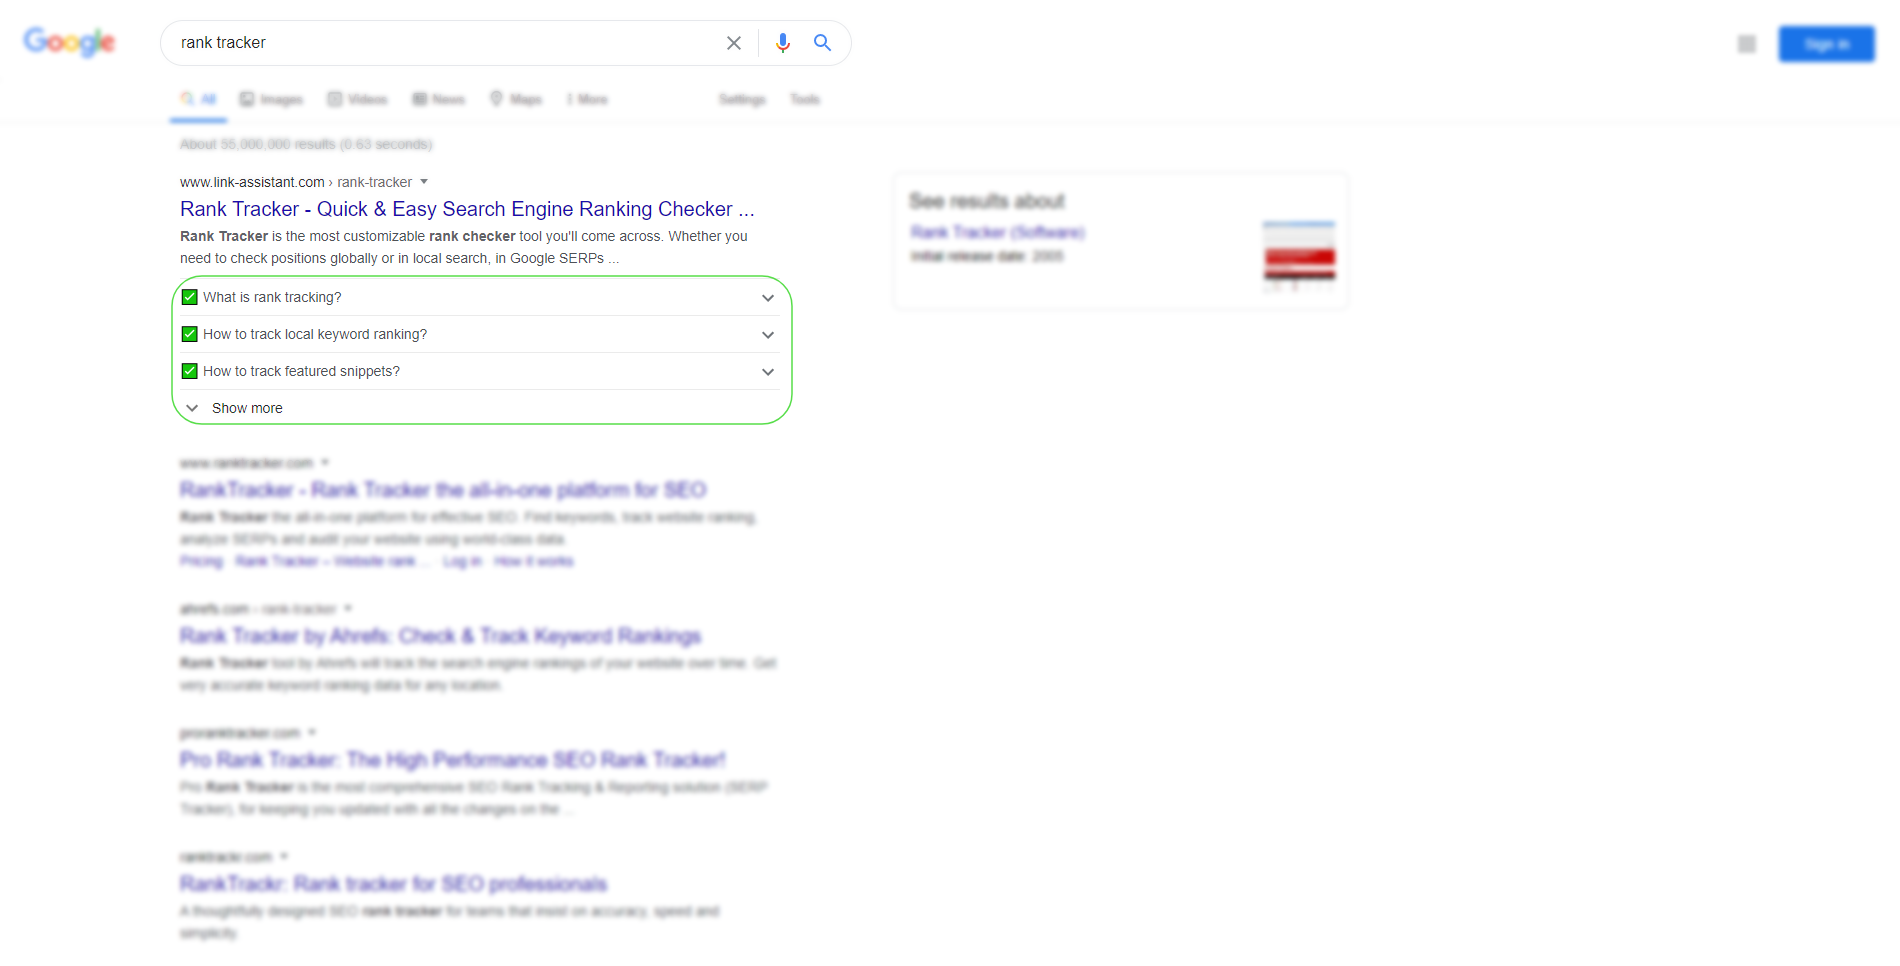 rank tracker - Google Search - Google Chrome 2020- (1).png